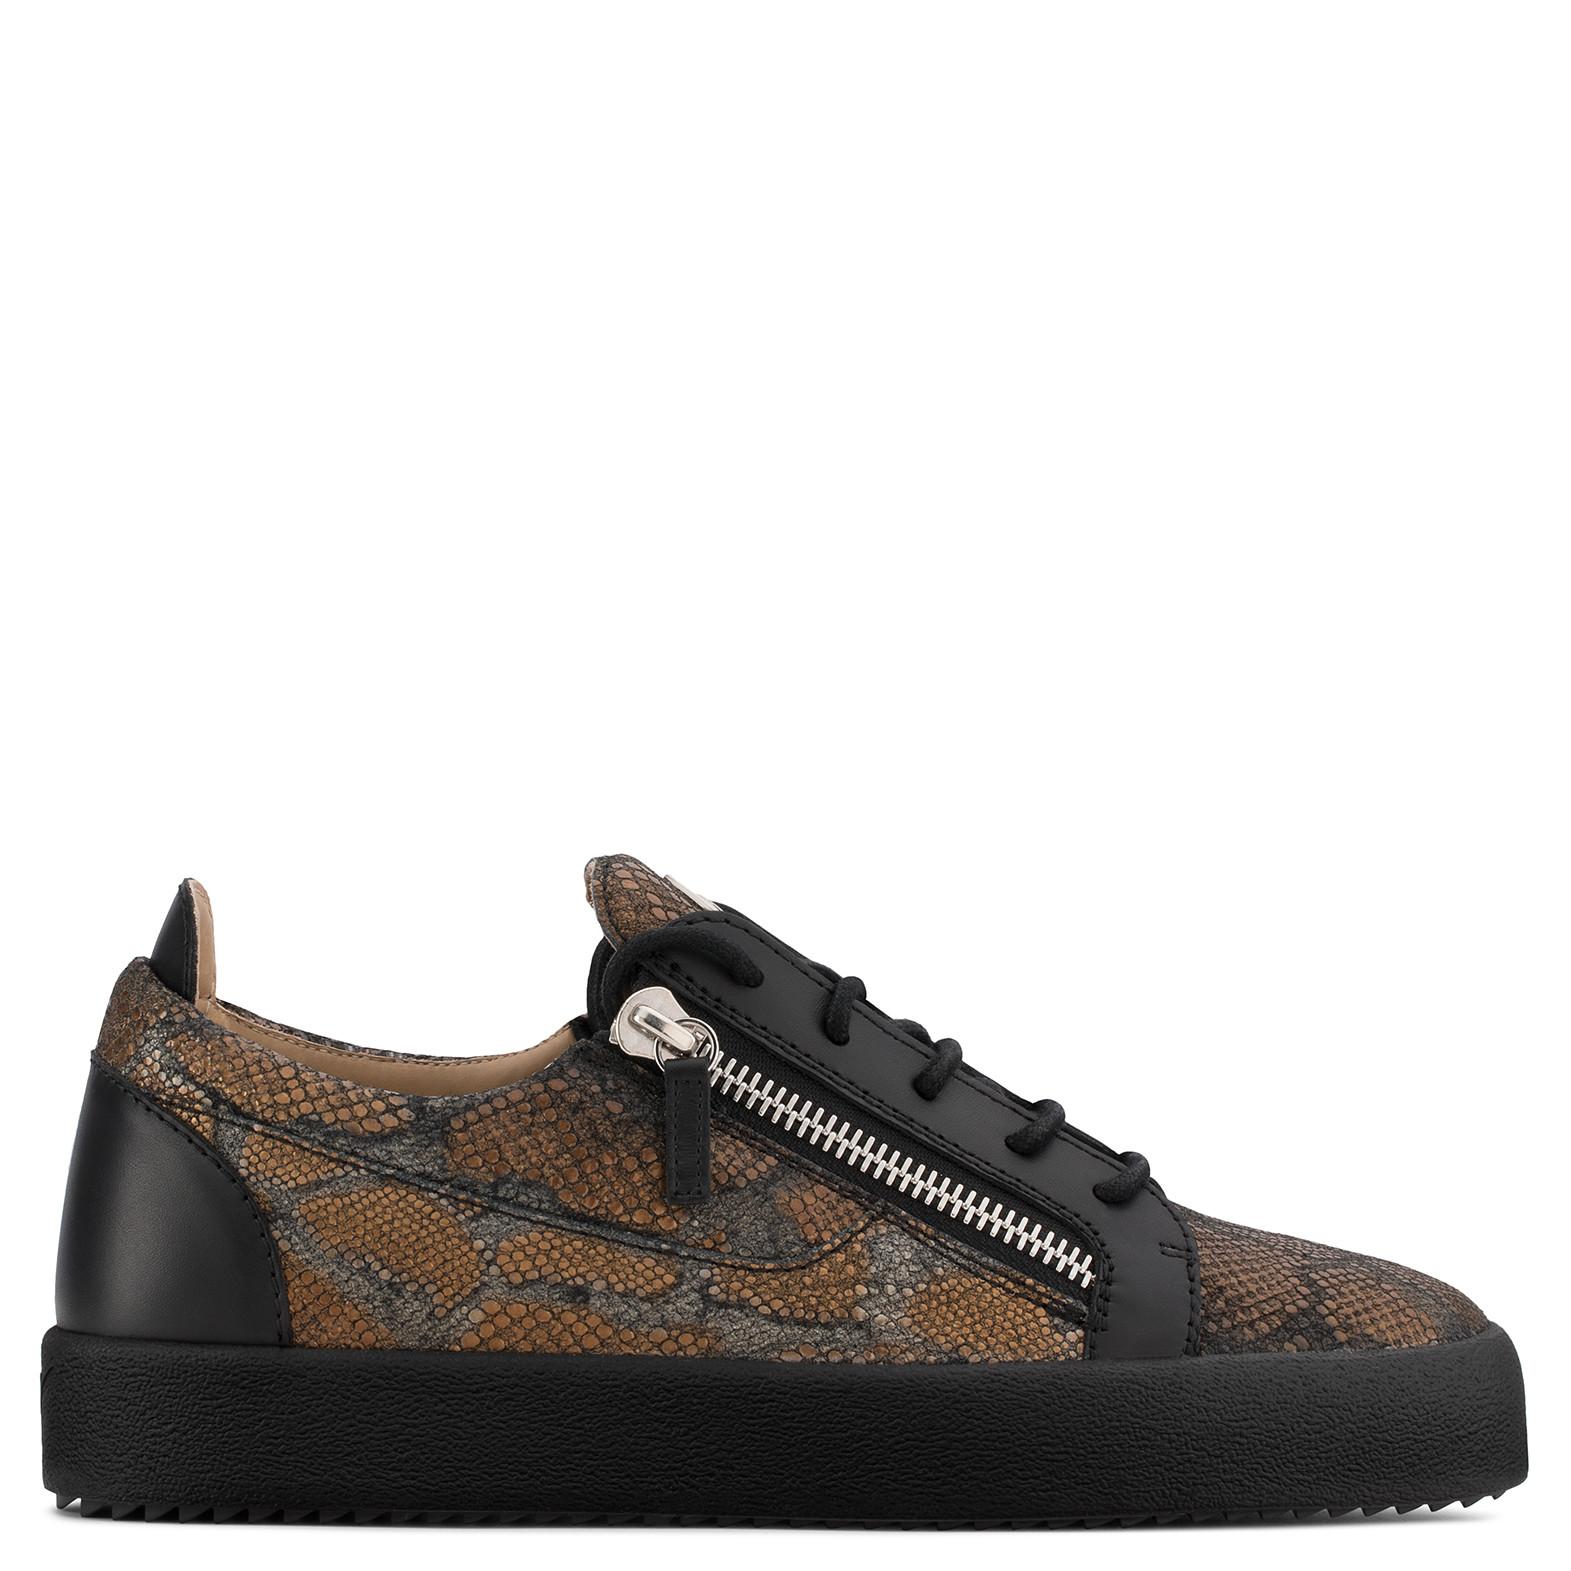 Wear Resistance Giuseppe Zanotti Bronze python-embossed calfskin leather sneaker KRISS New vmZ3a